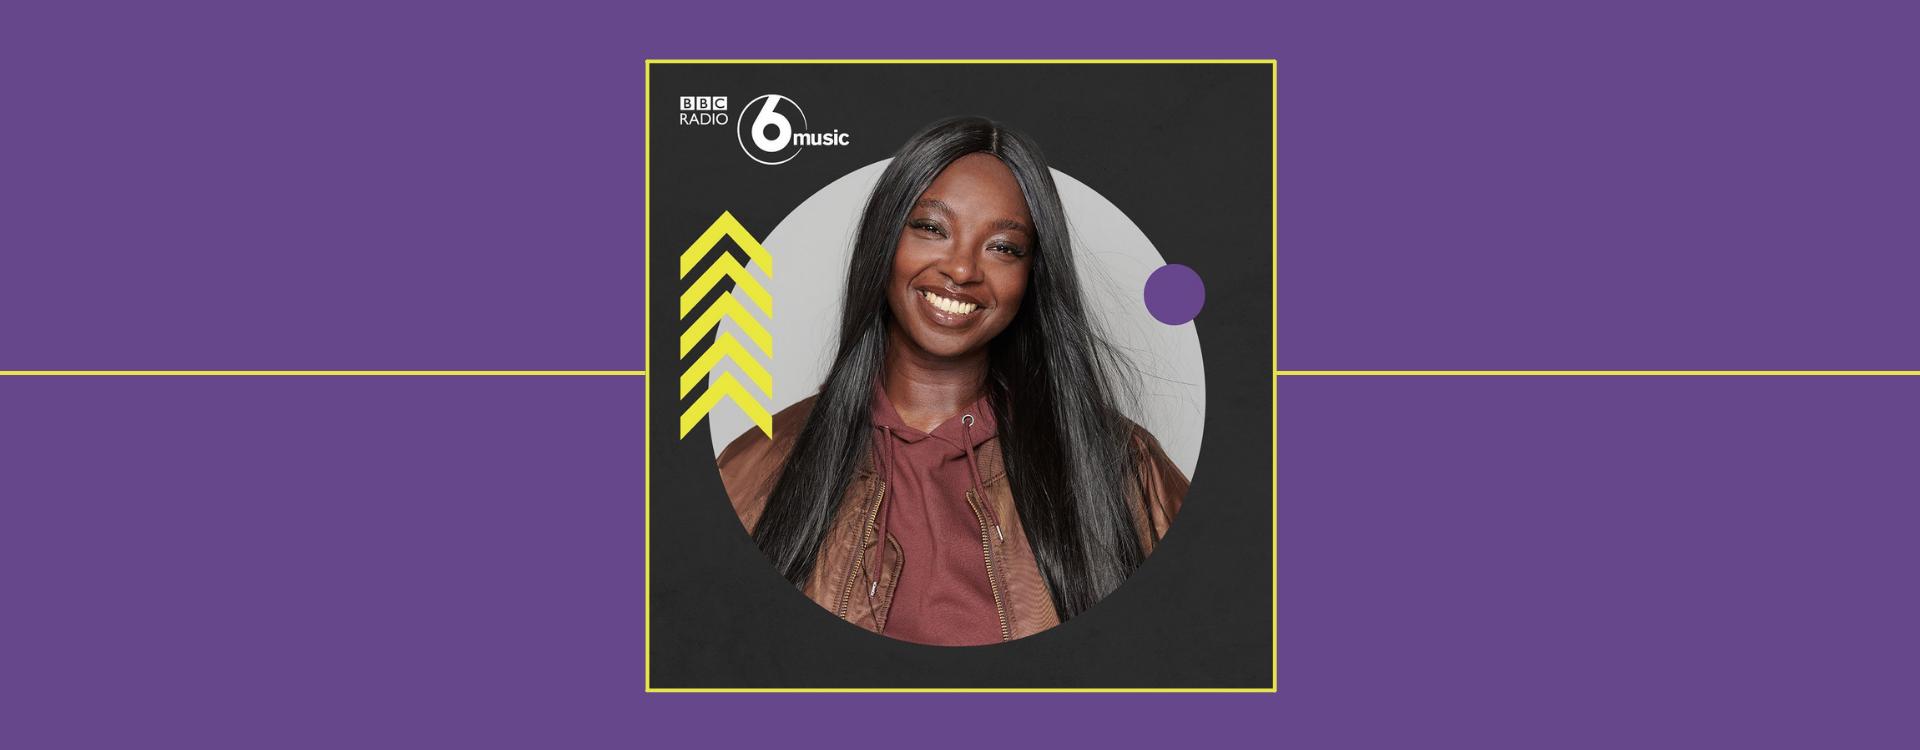 BBC 6 (featured image)